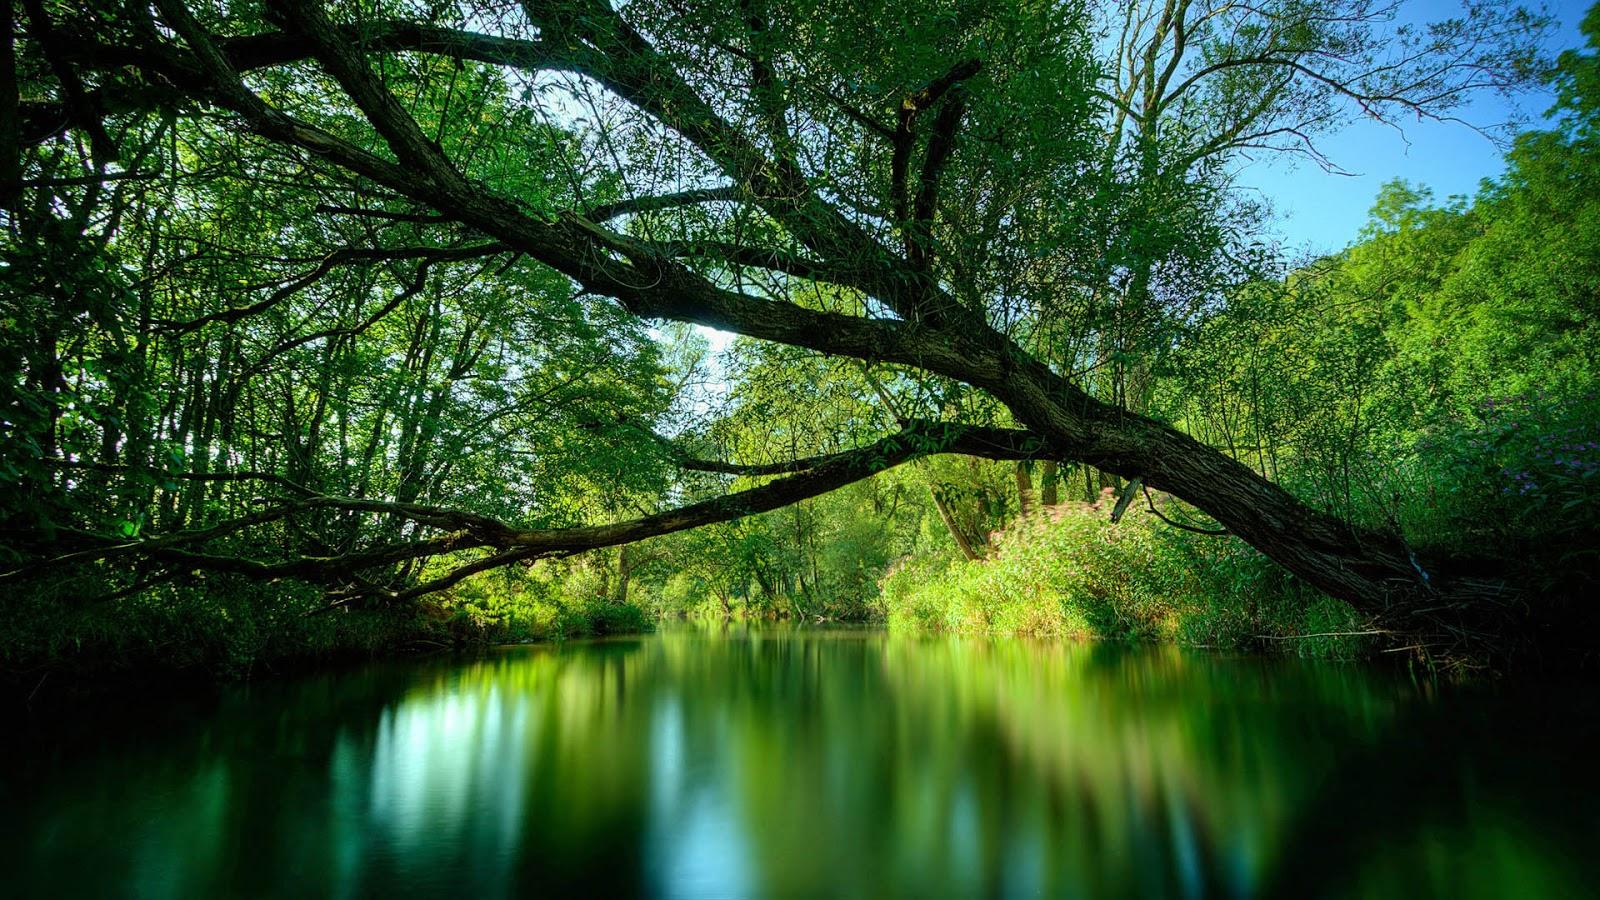 Wallpaper hd river flows in you noten - c1f0